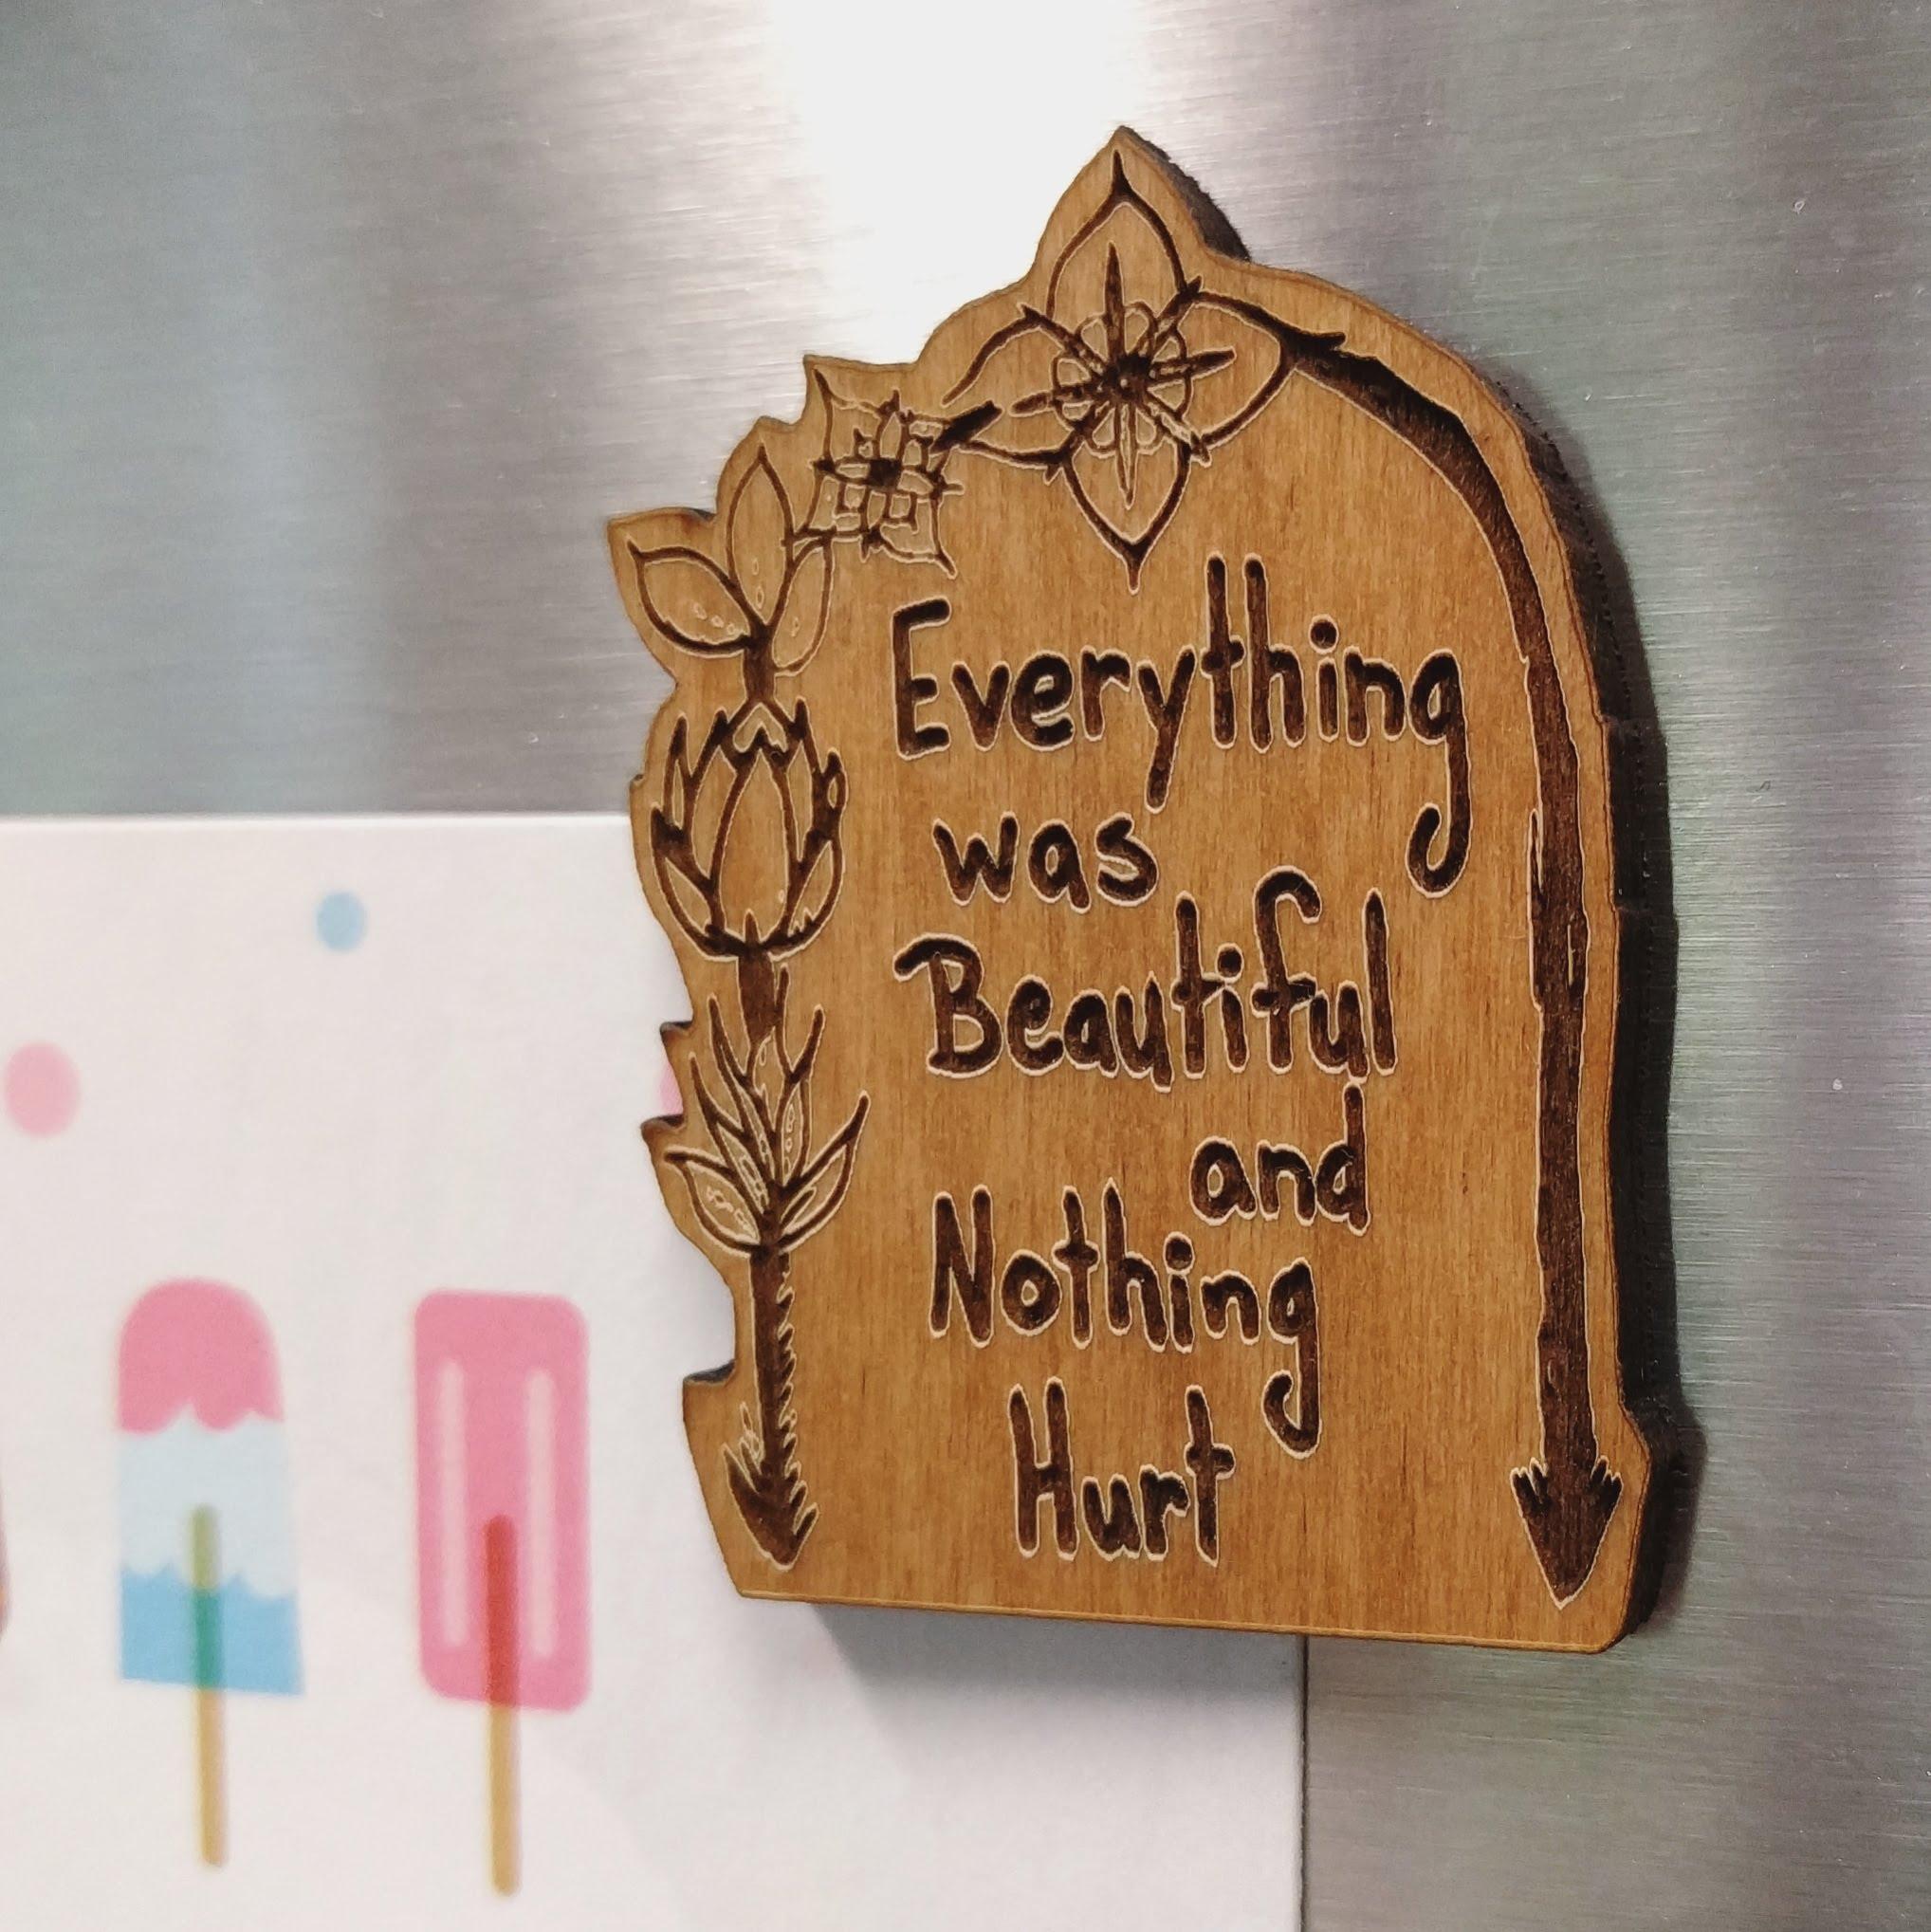 NothingHurtSocial - Brandy Davis.jpg